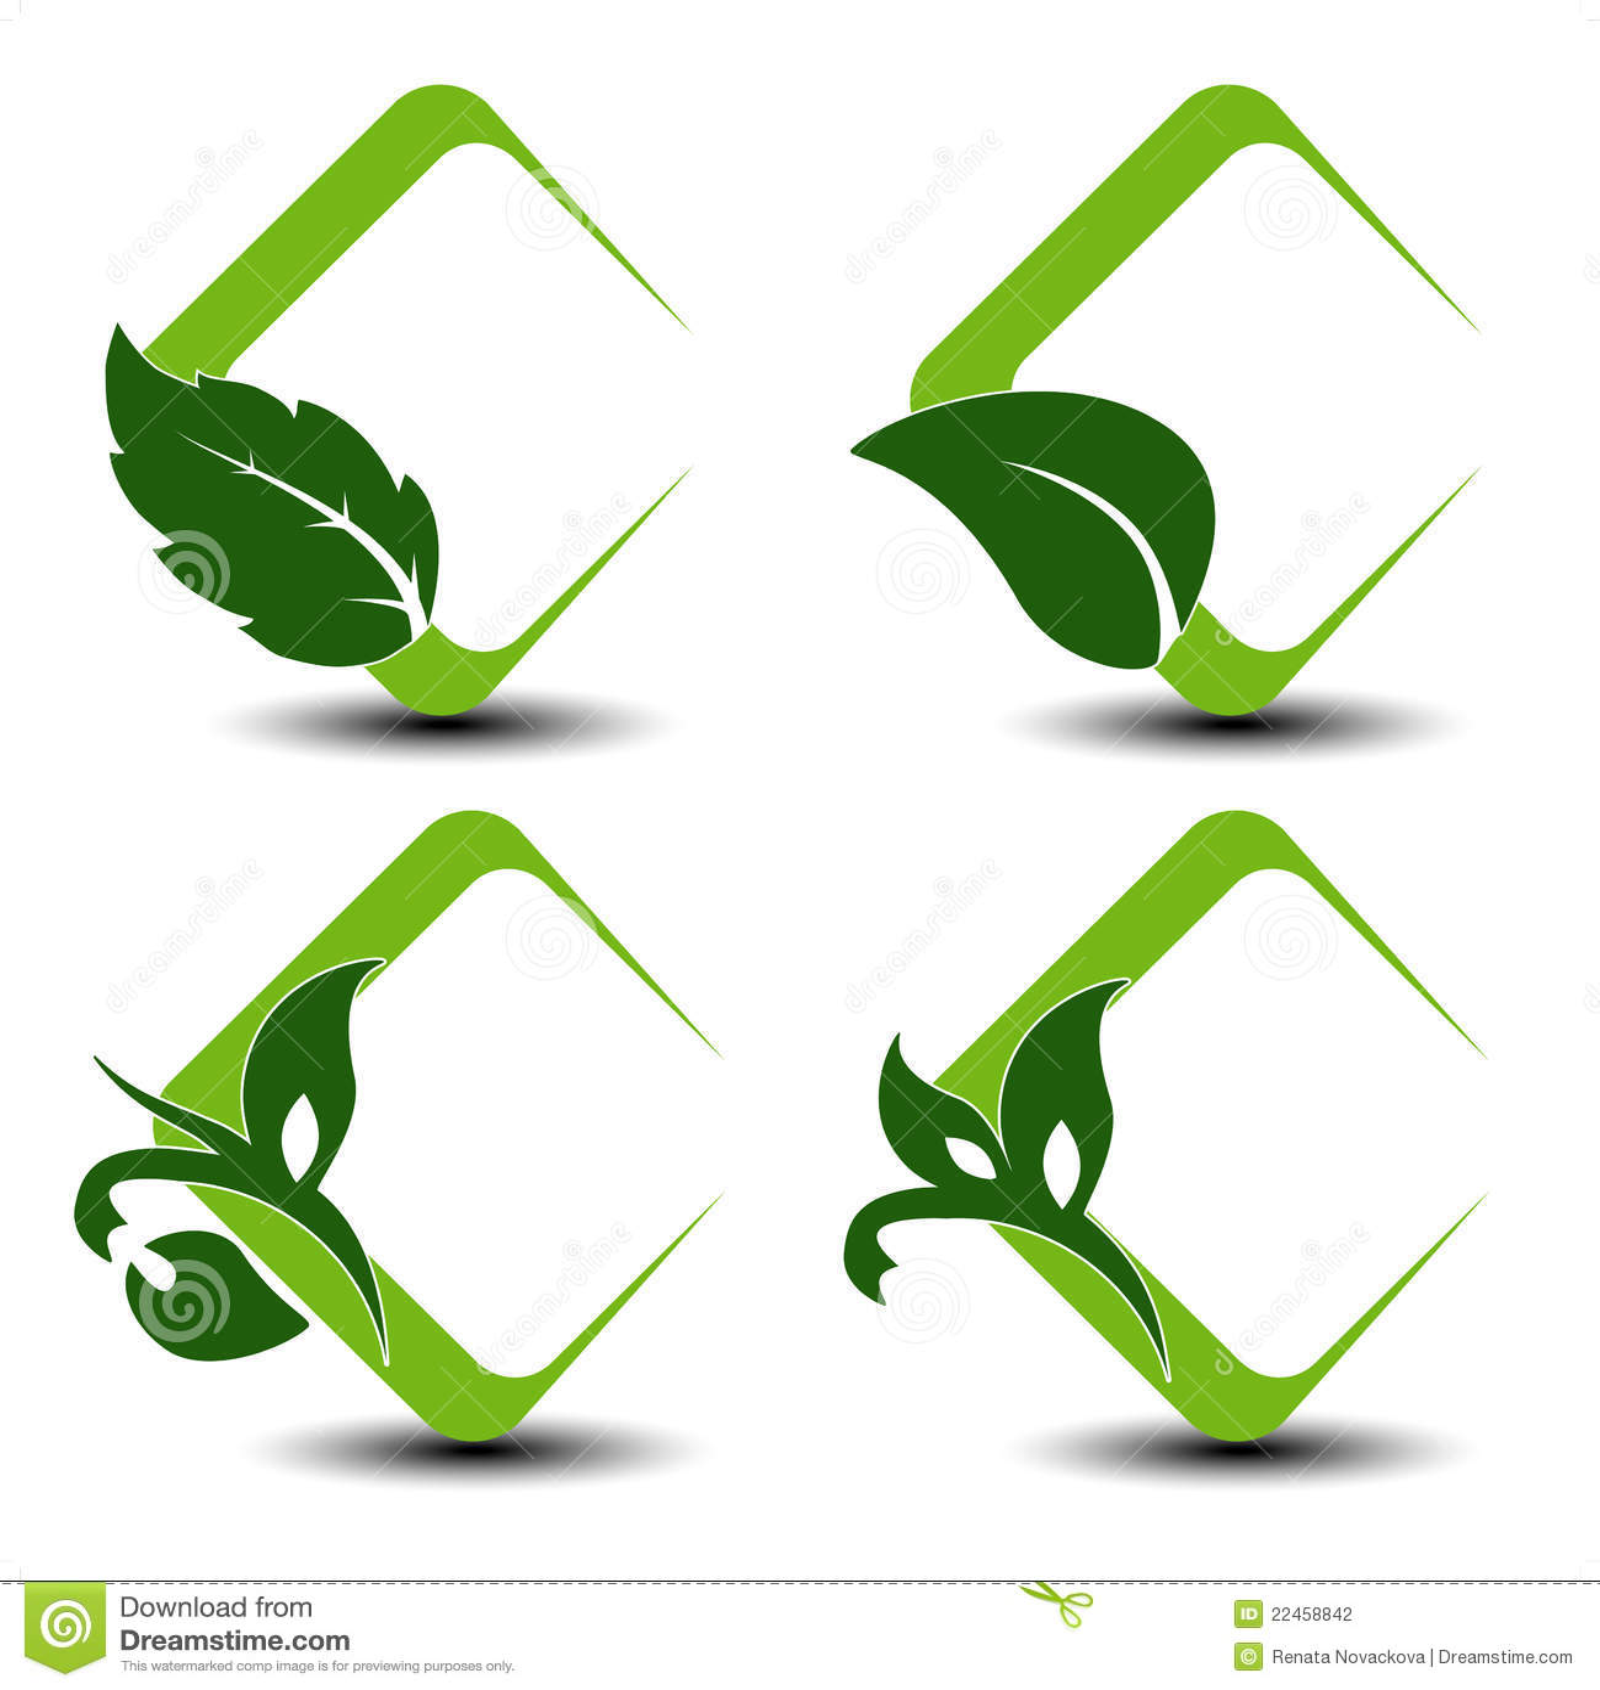 Natural symbols with leaf illustration see also my portfolio